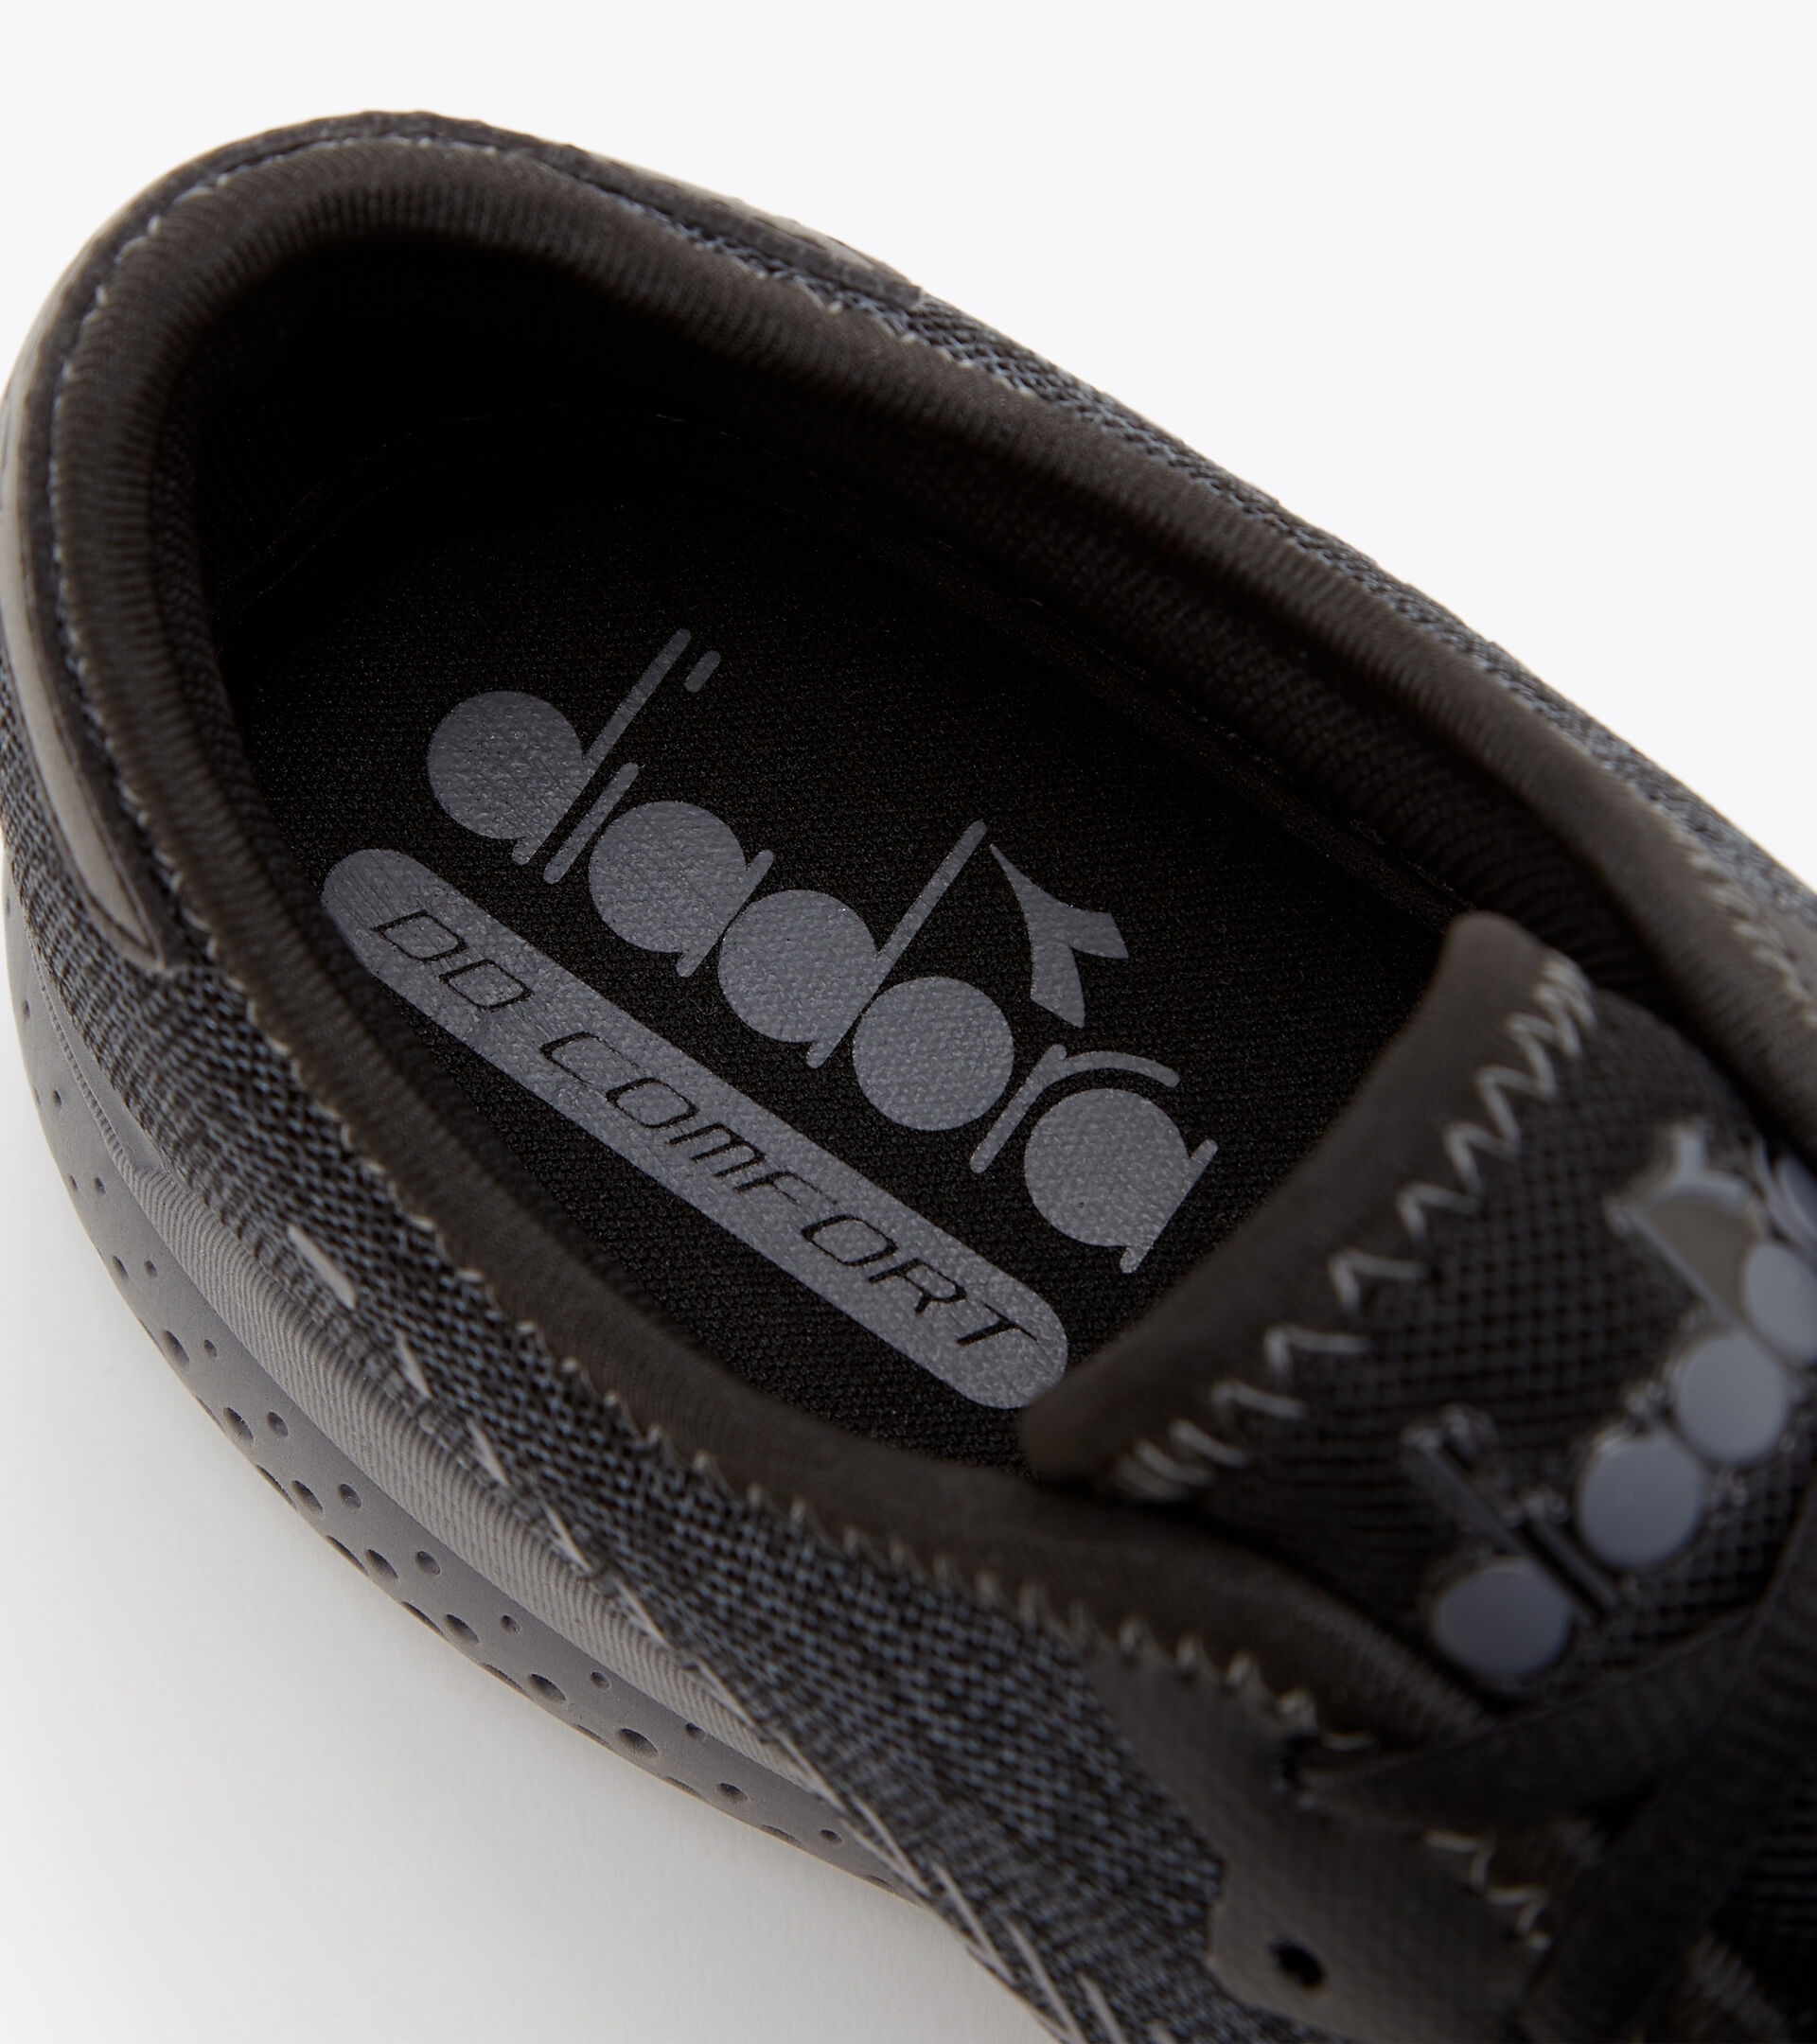 Footwear Sport UOMO PASSO NEGRO/GRIS ACERO Diadora